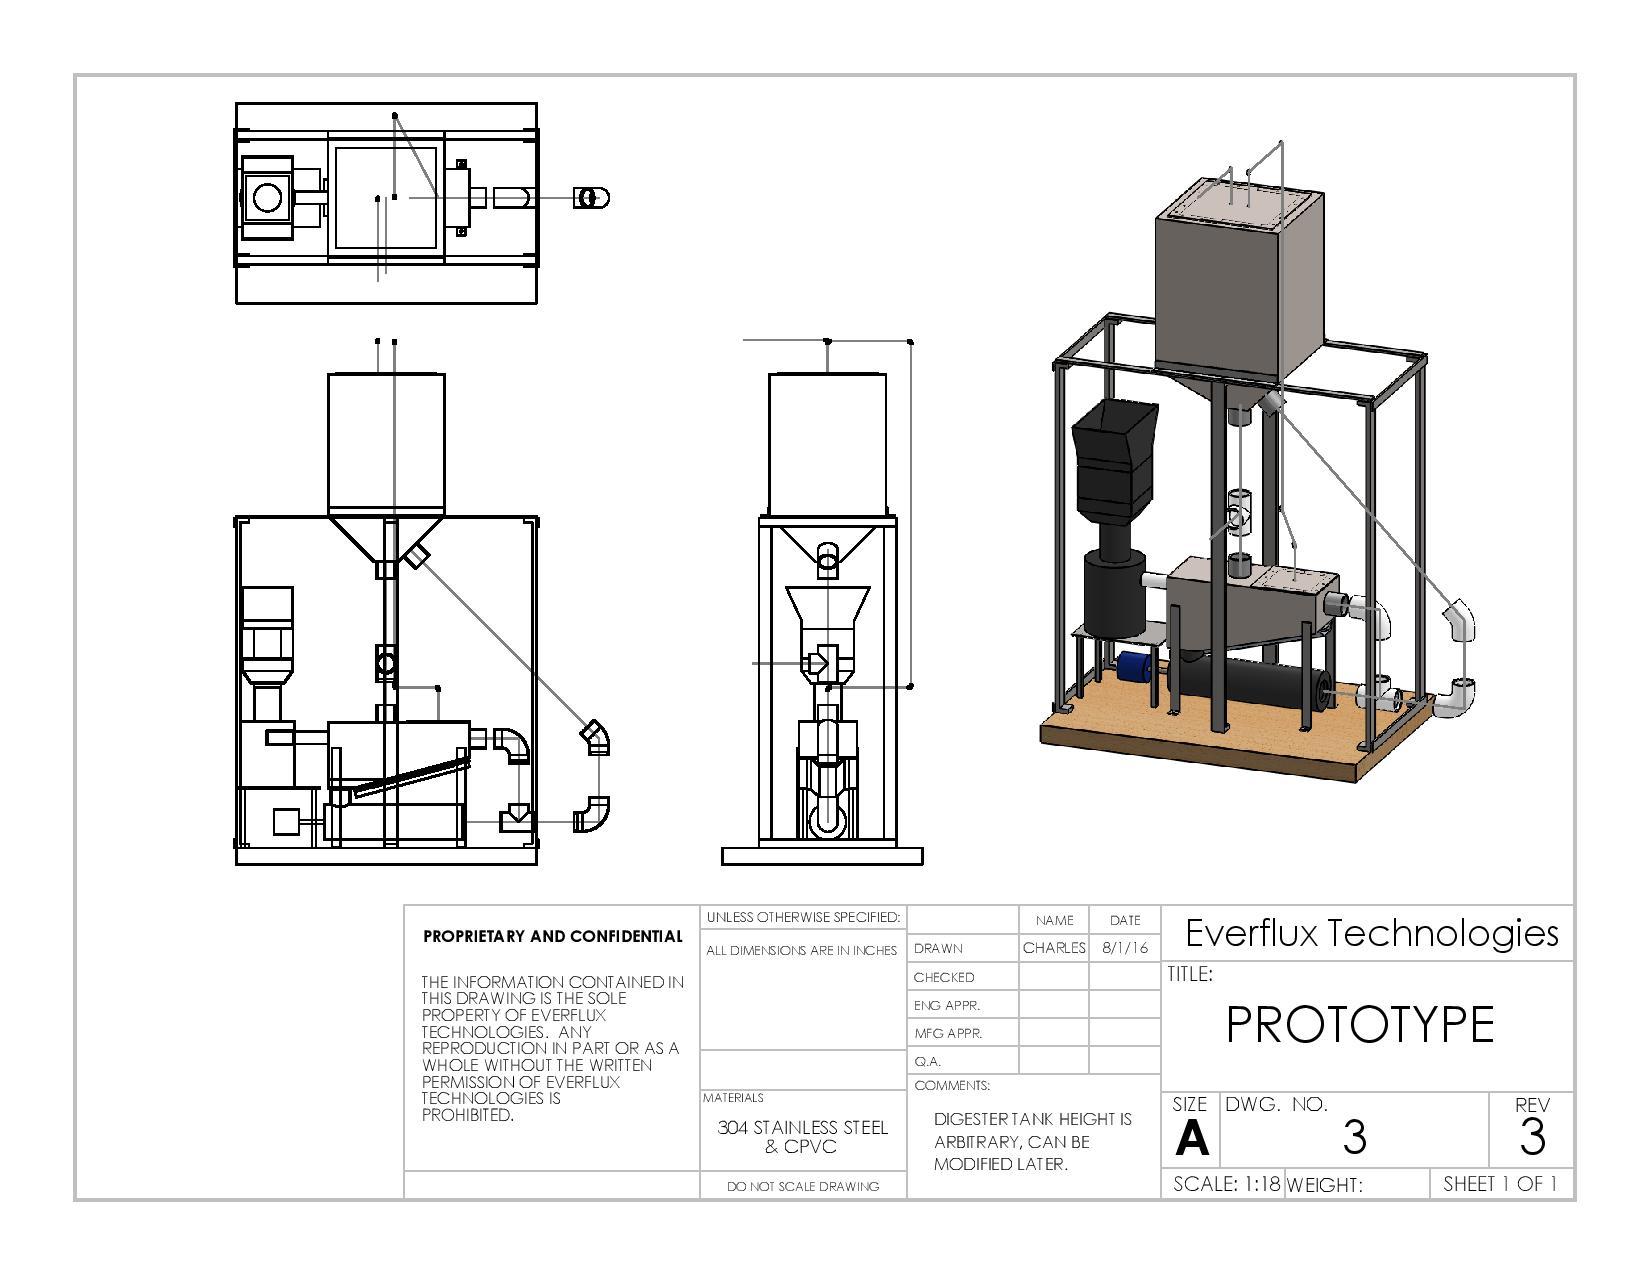 Everflux Technologies prototype